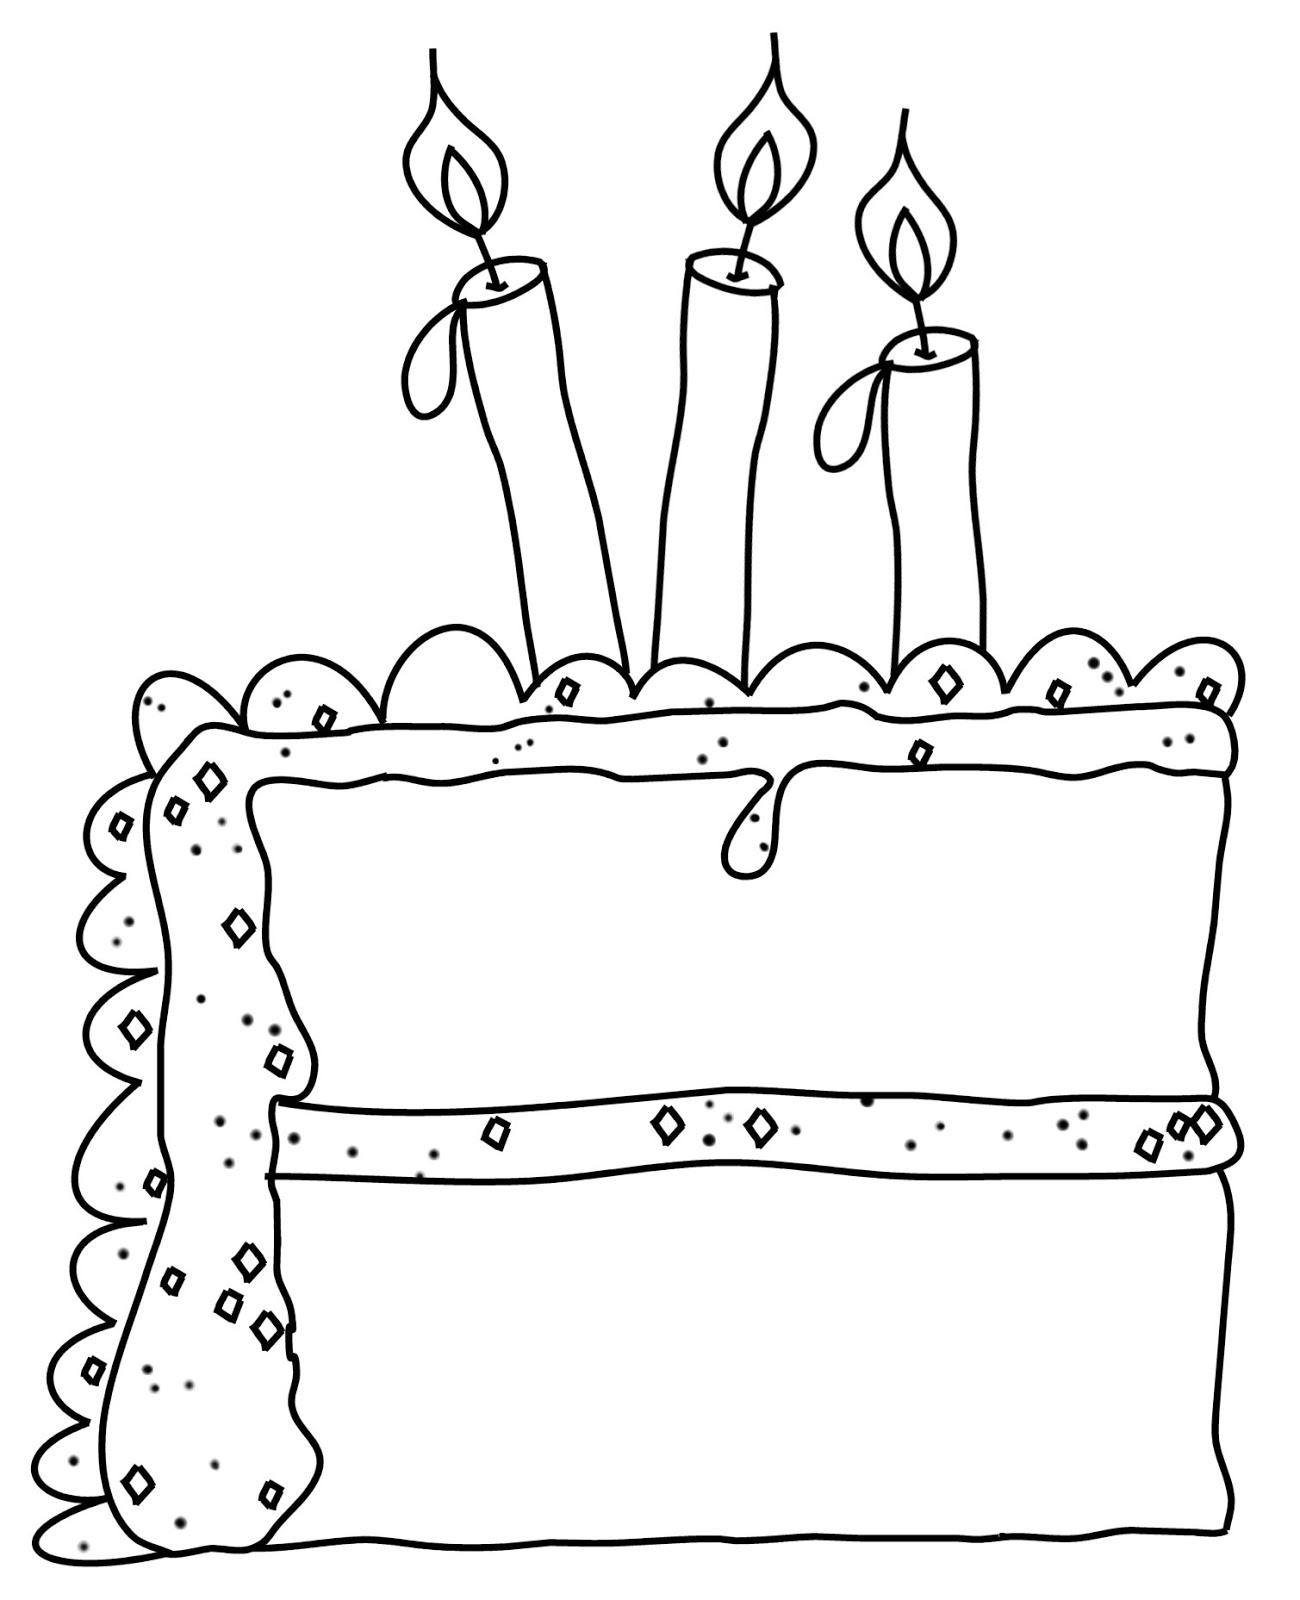 http://1.bp.blogspot.com/-foXdd3tw8X8/U37zAXHxcdI/AAAAAAAAJhc/C9wN1sw6zTo/s1600/Birthday+Cake+Slice.jpg